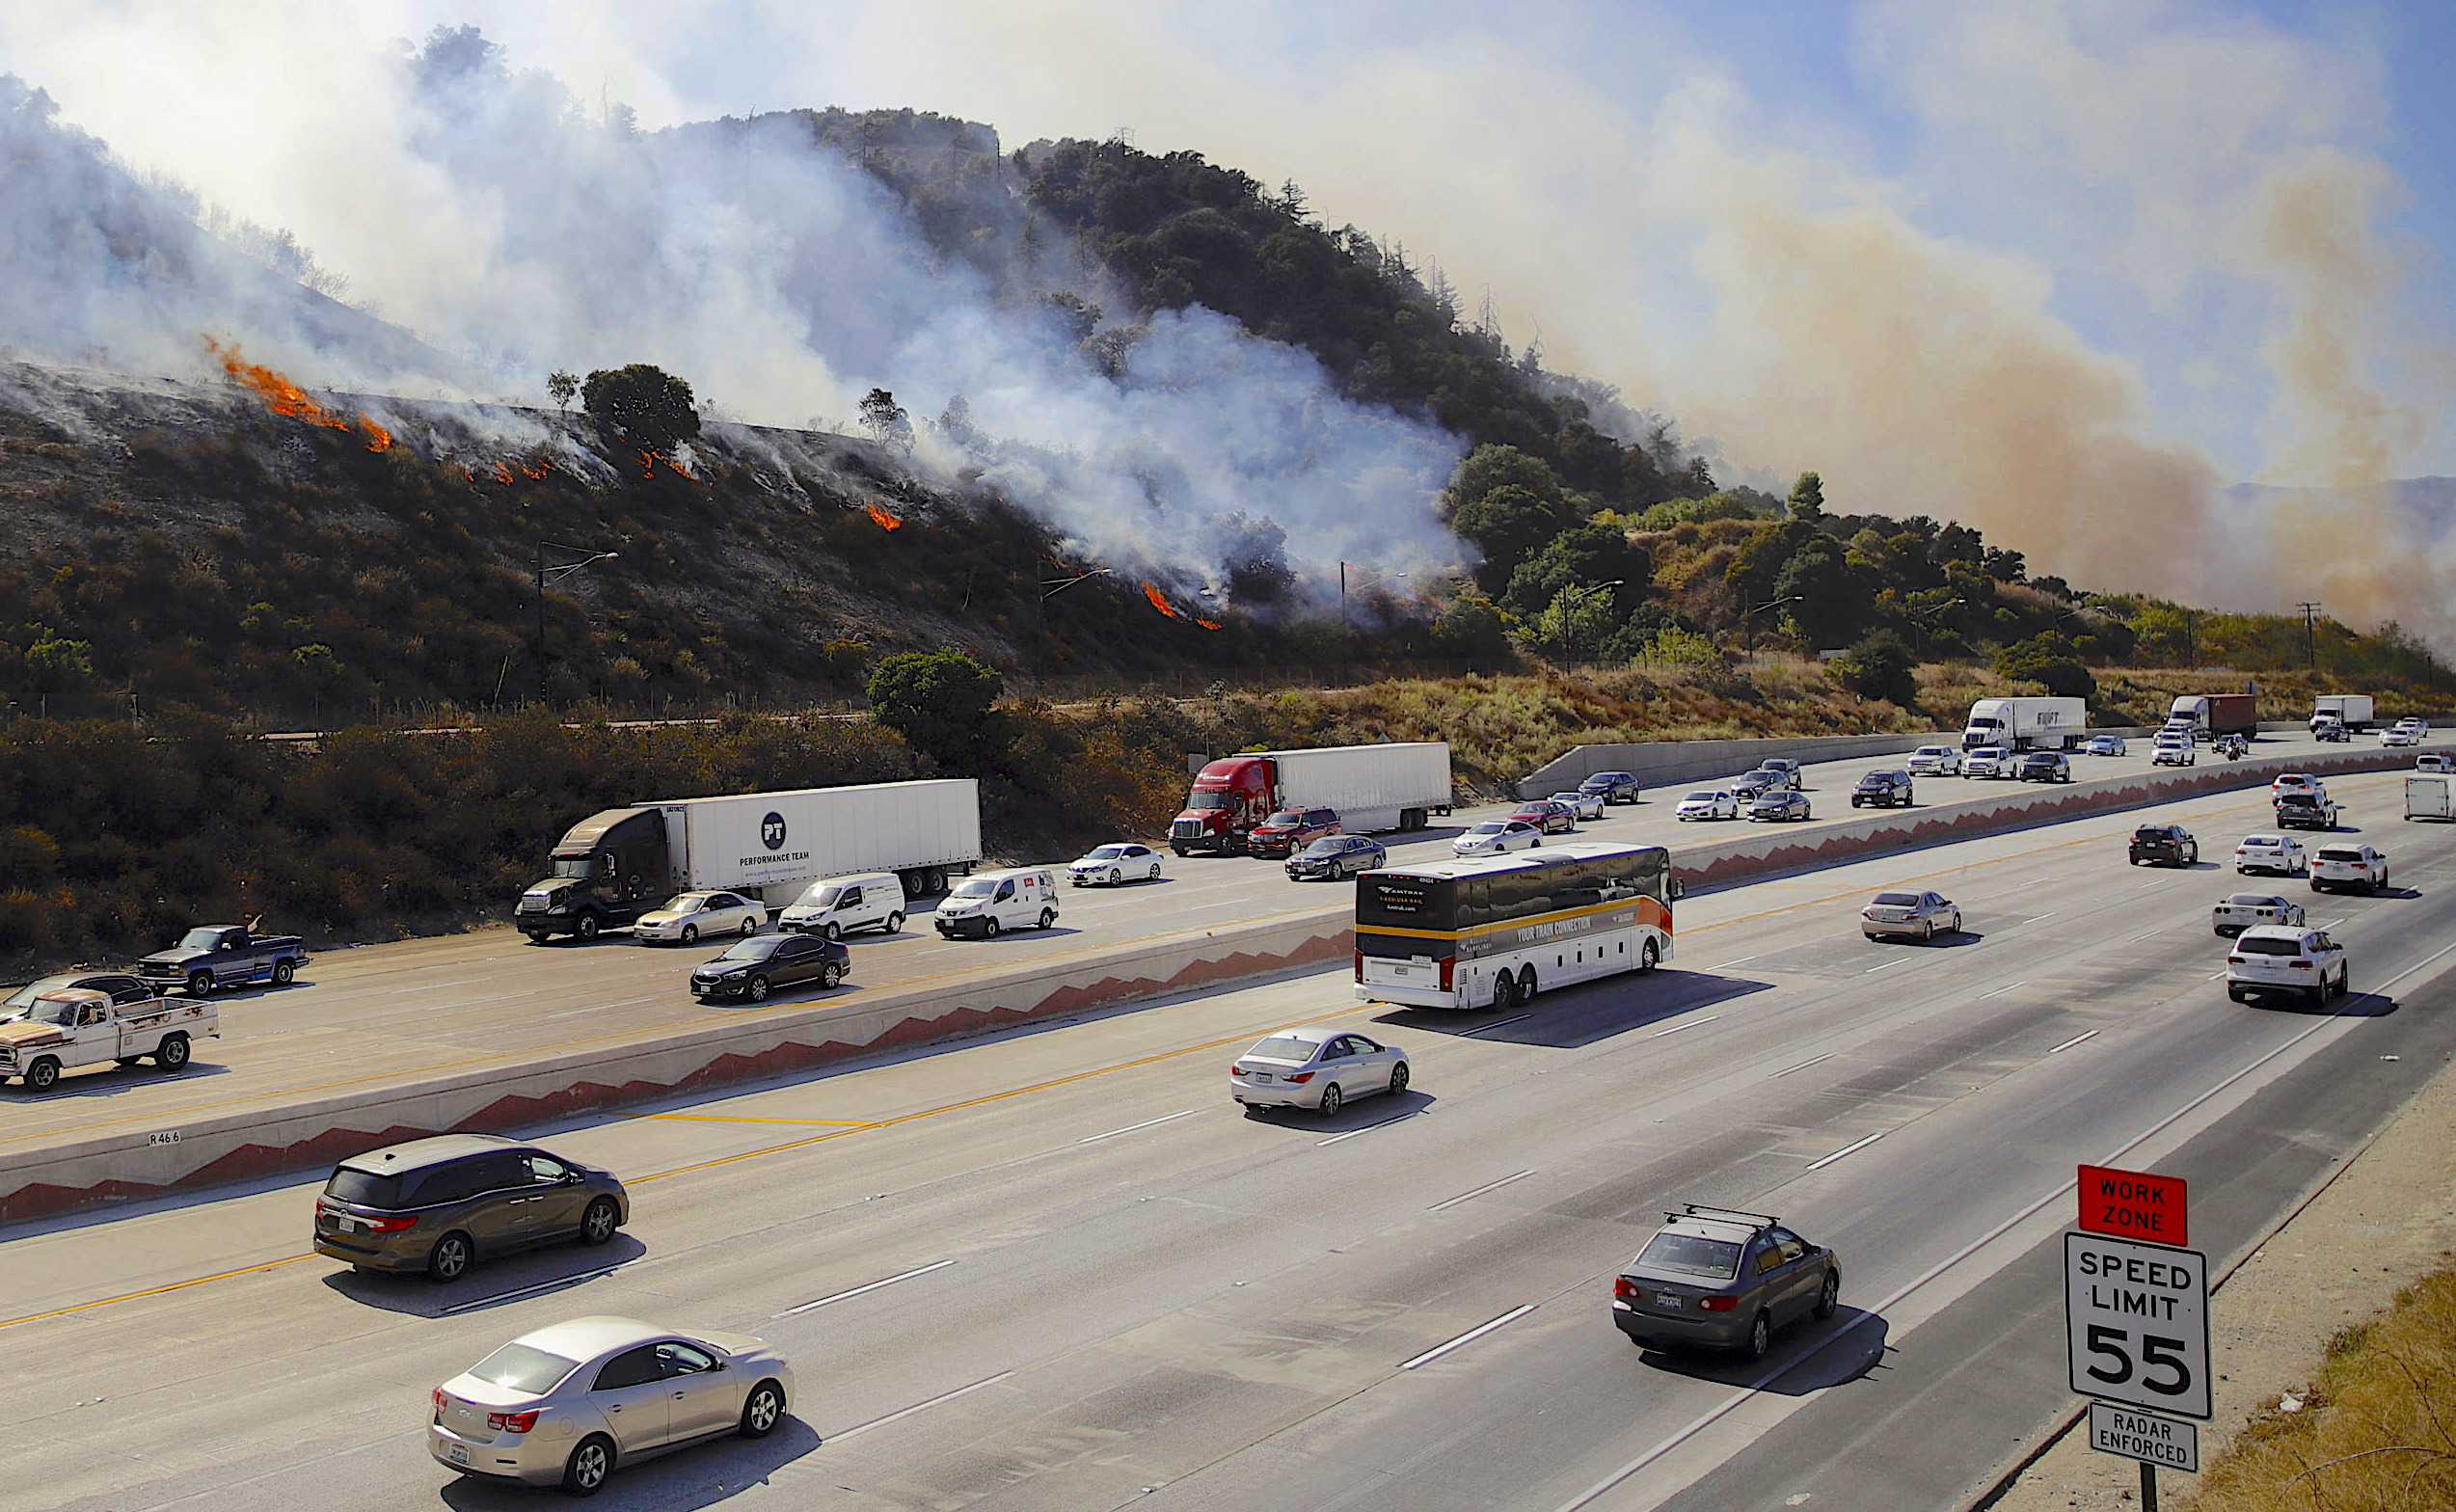 'Sundowner' winds could fan flames in Southern California